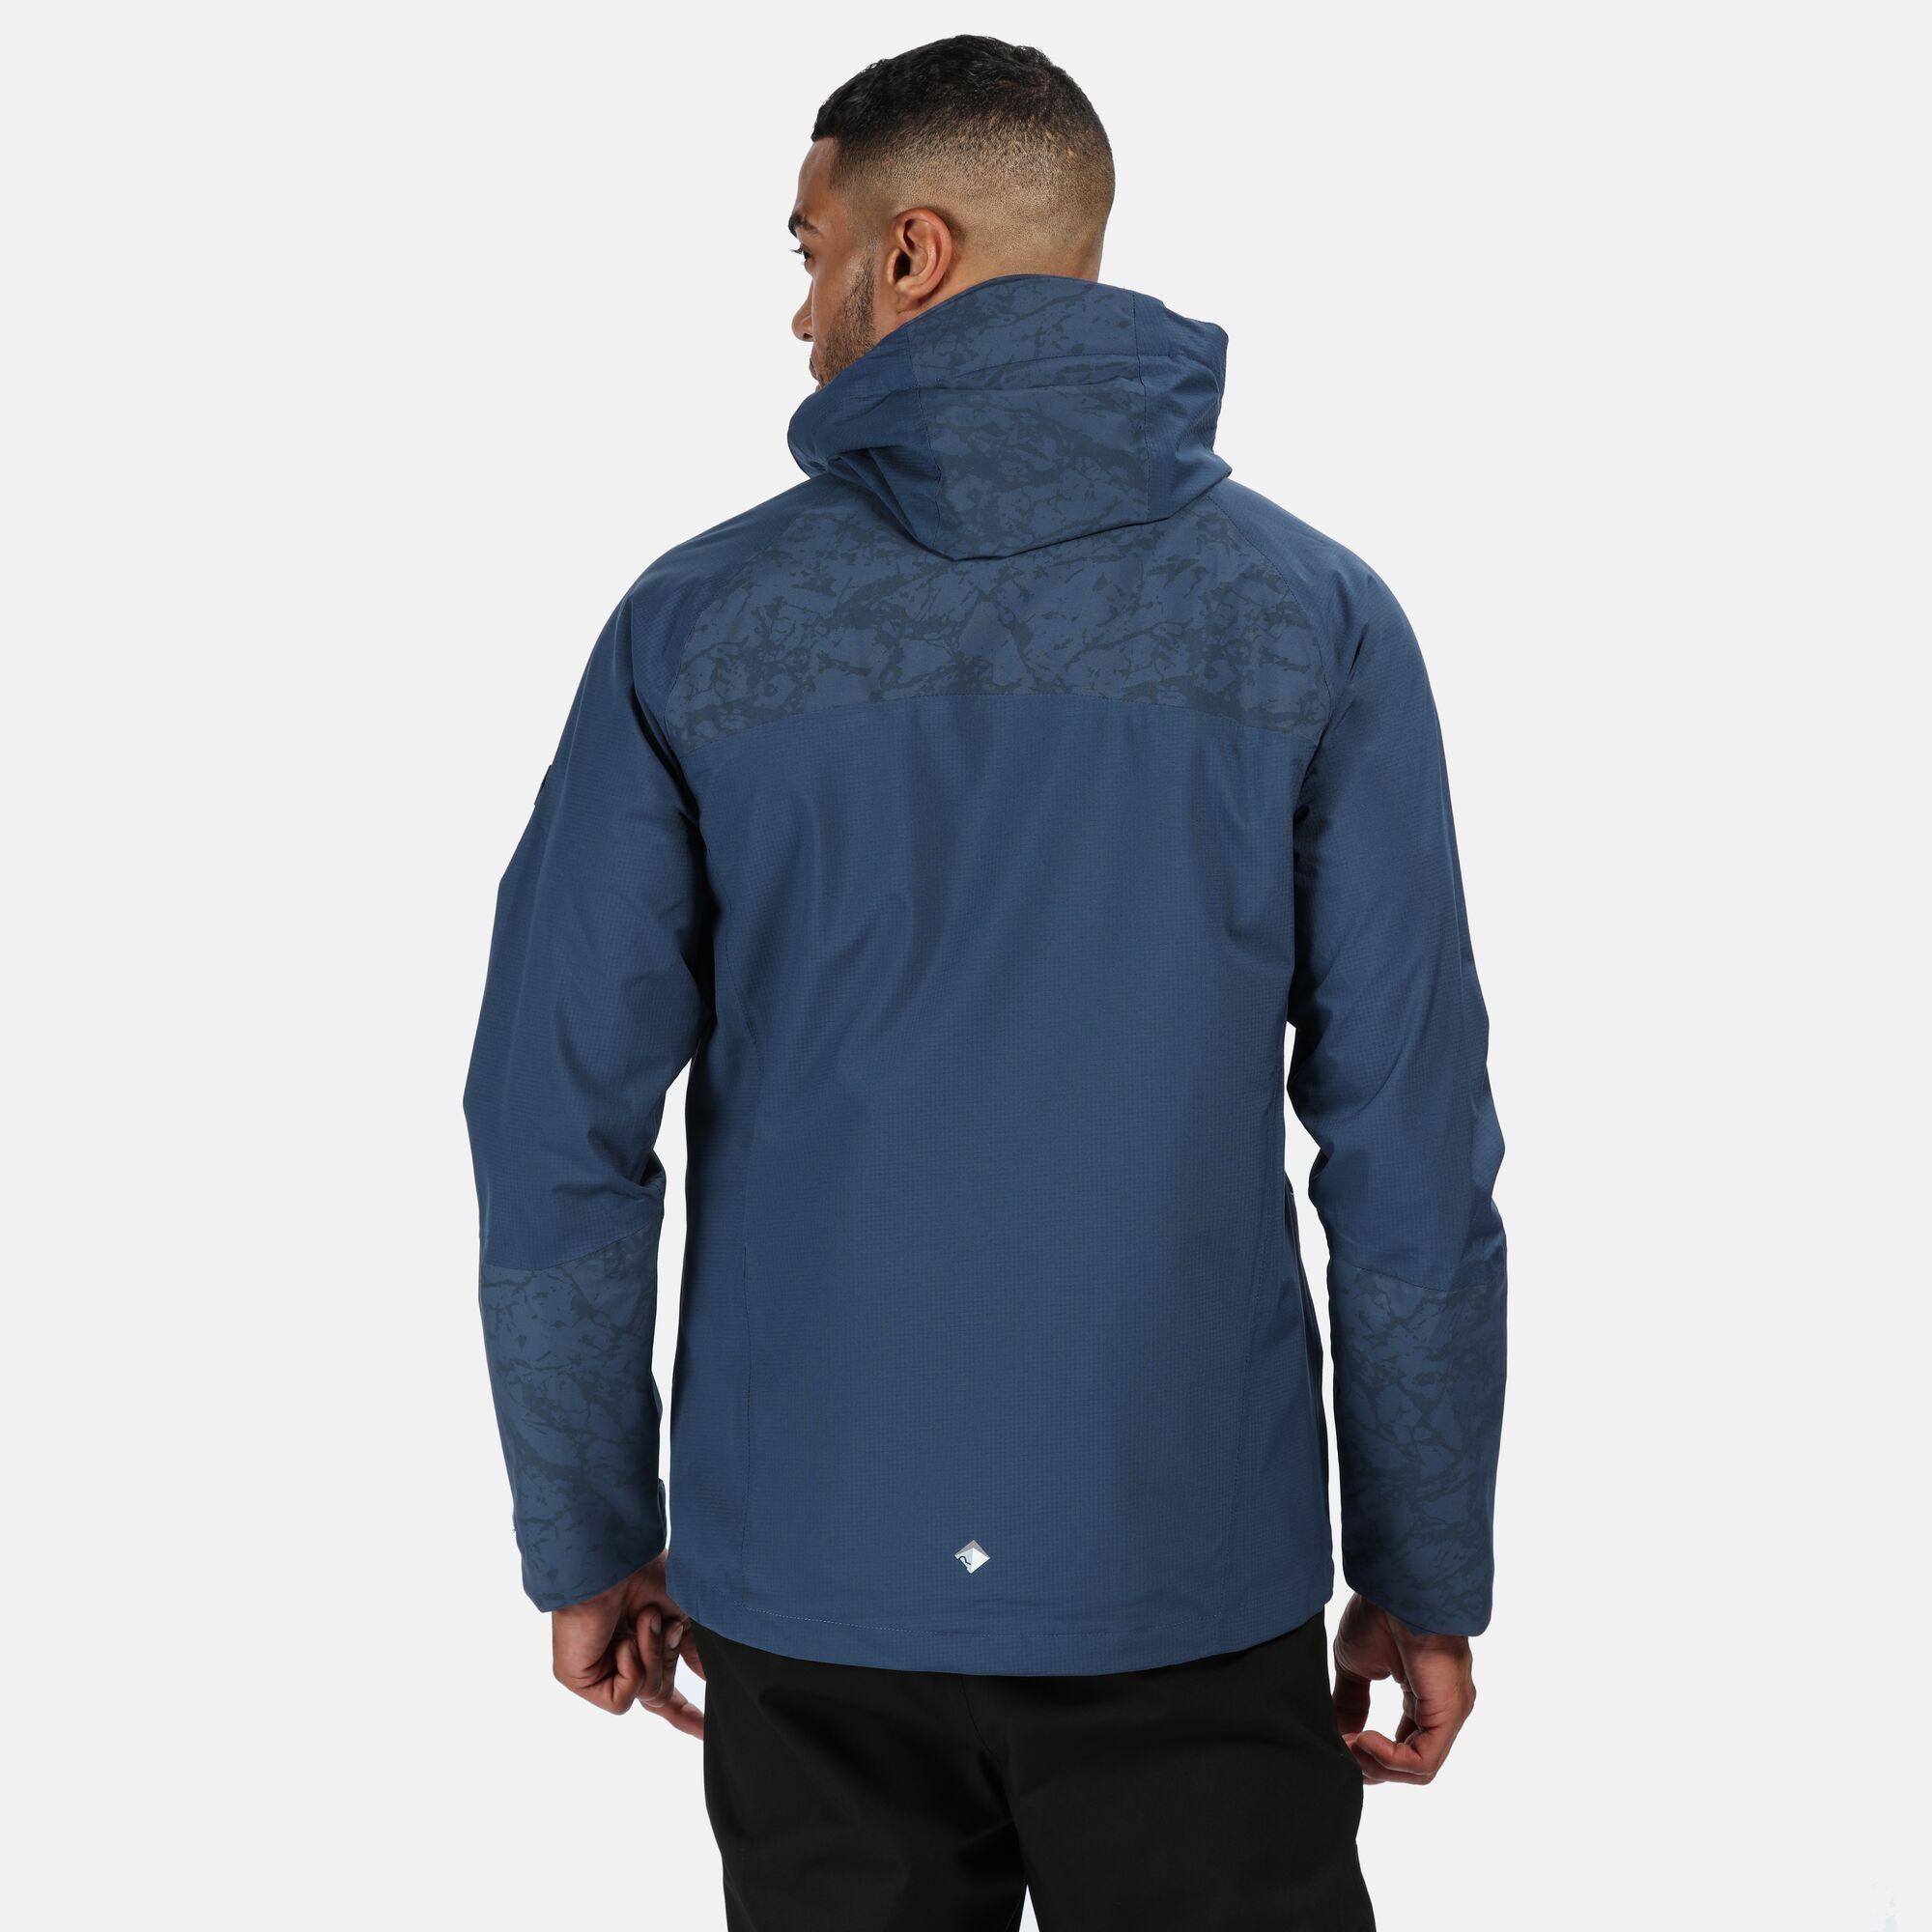 Regatta-Men-039-s-Oklahoma-V-Reflective-Waterproof-Hooded-Walking-Jacket-Blue thumbnail 7